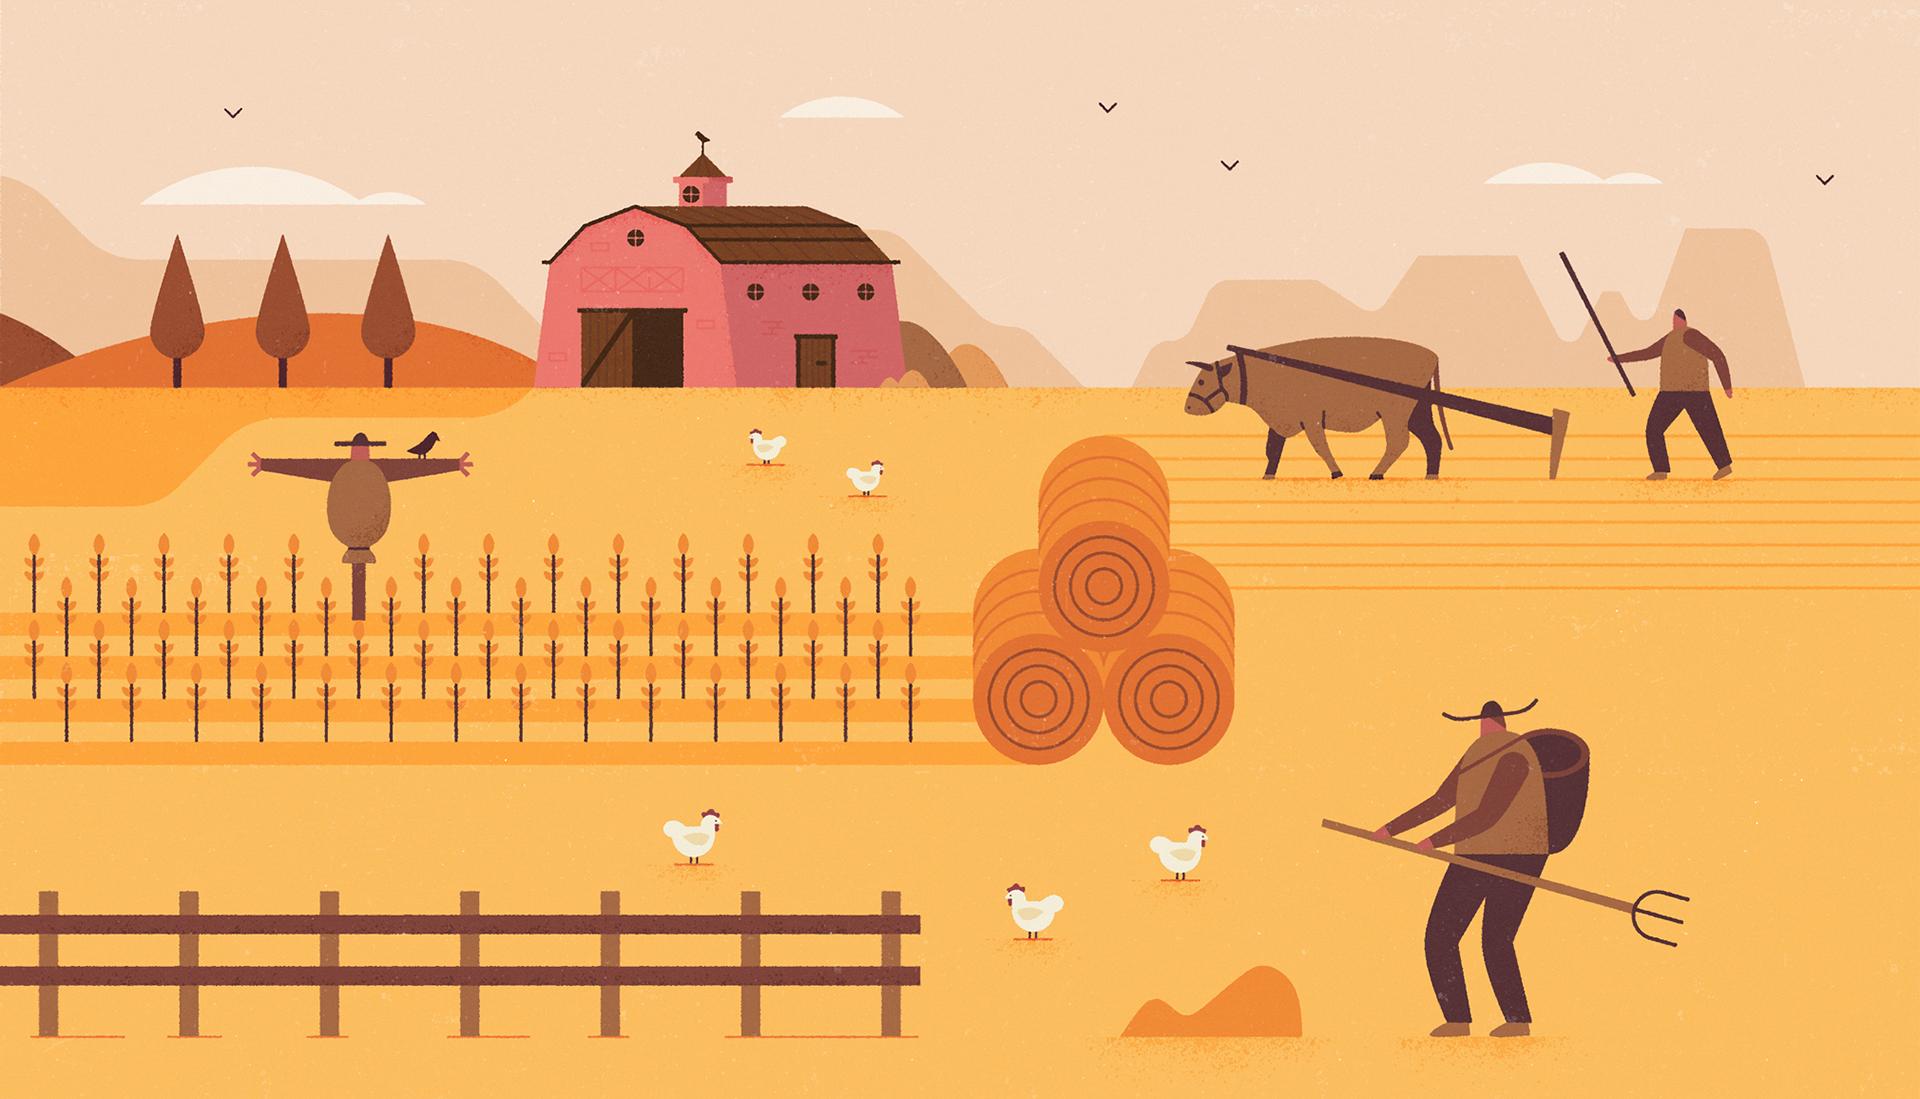 Harvest illustrations